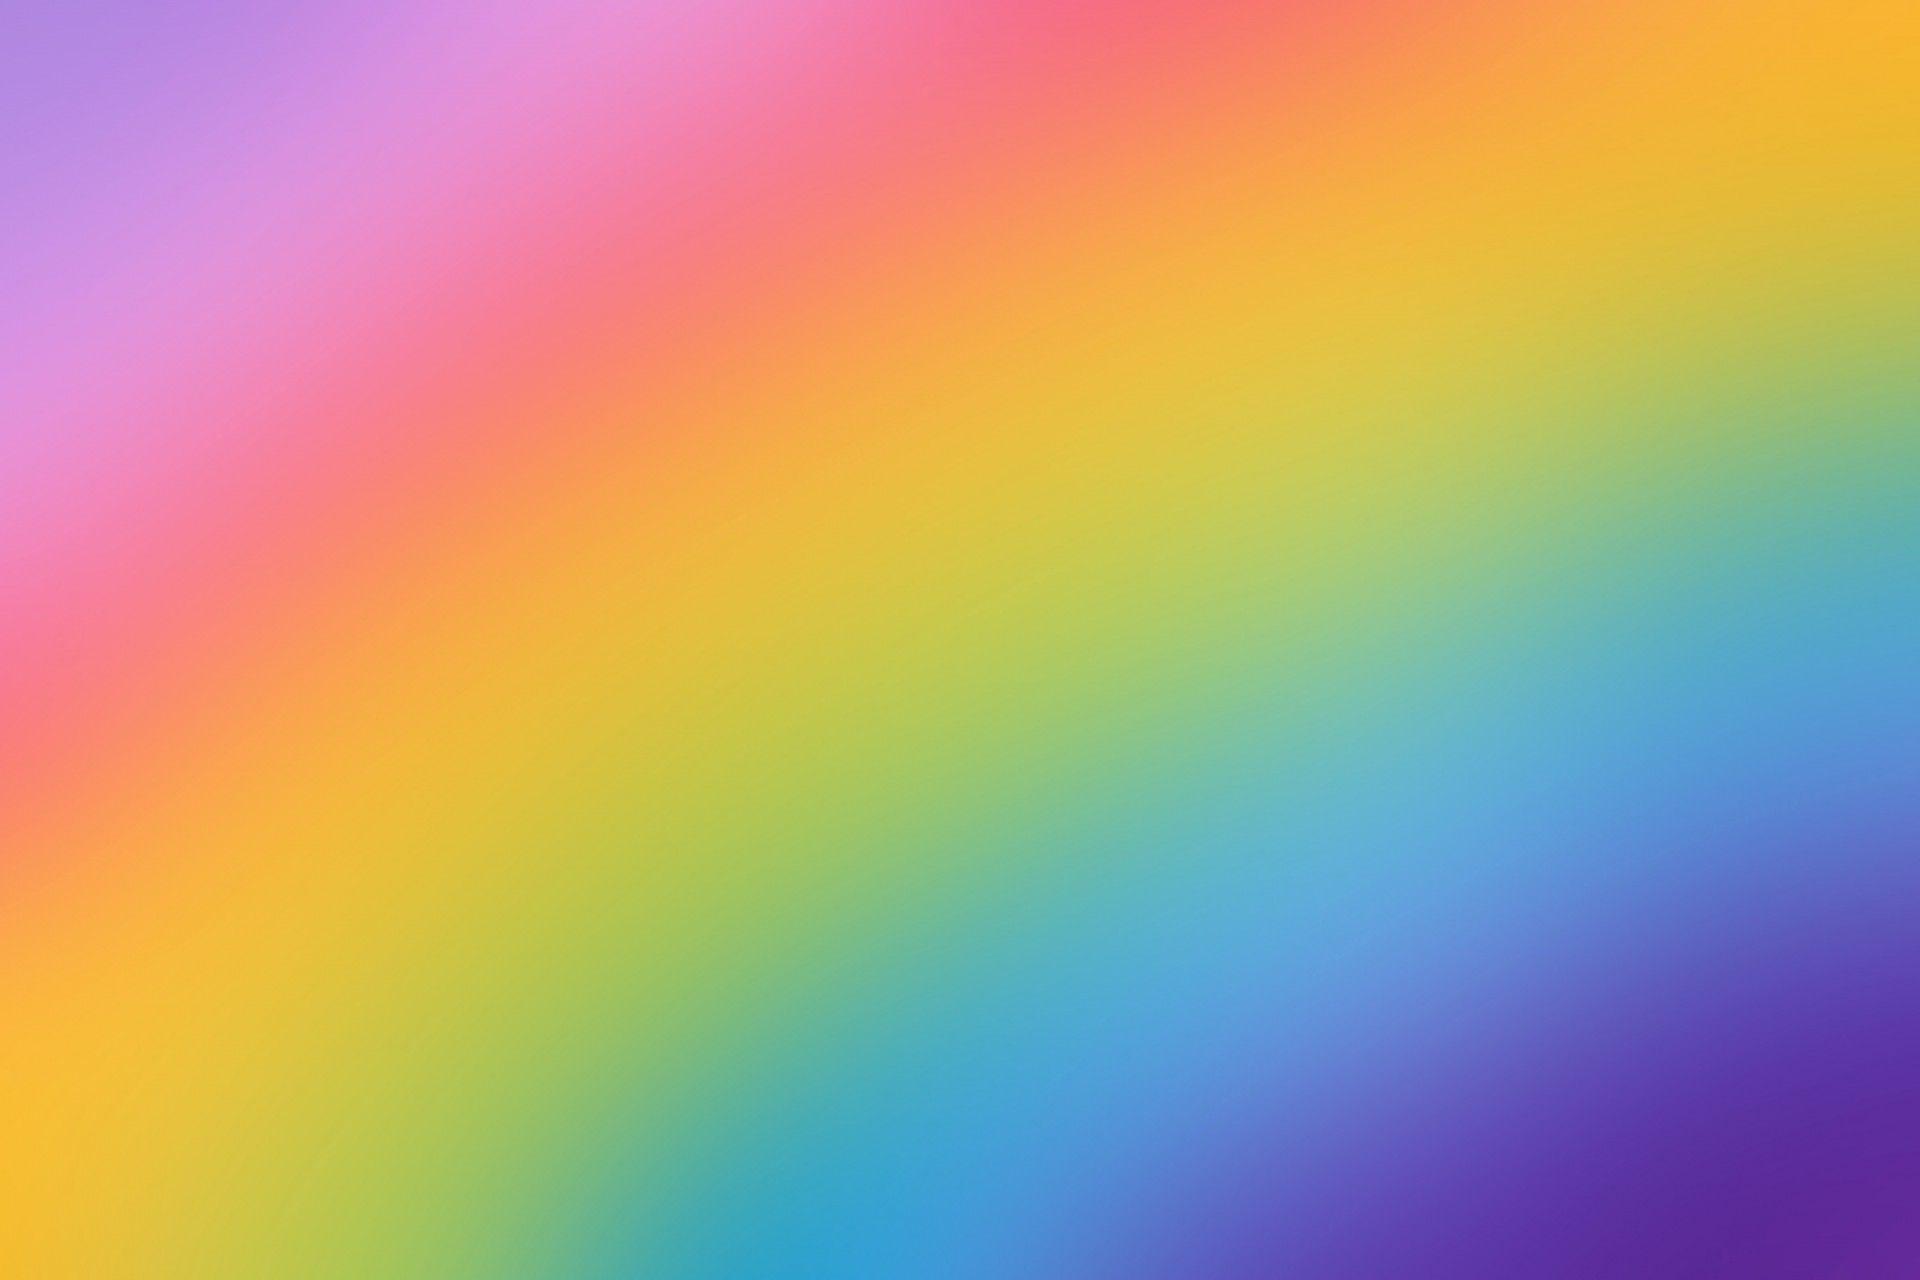 Rainbow Colors Background Free Stock Photo Dengan Gambar